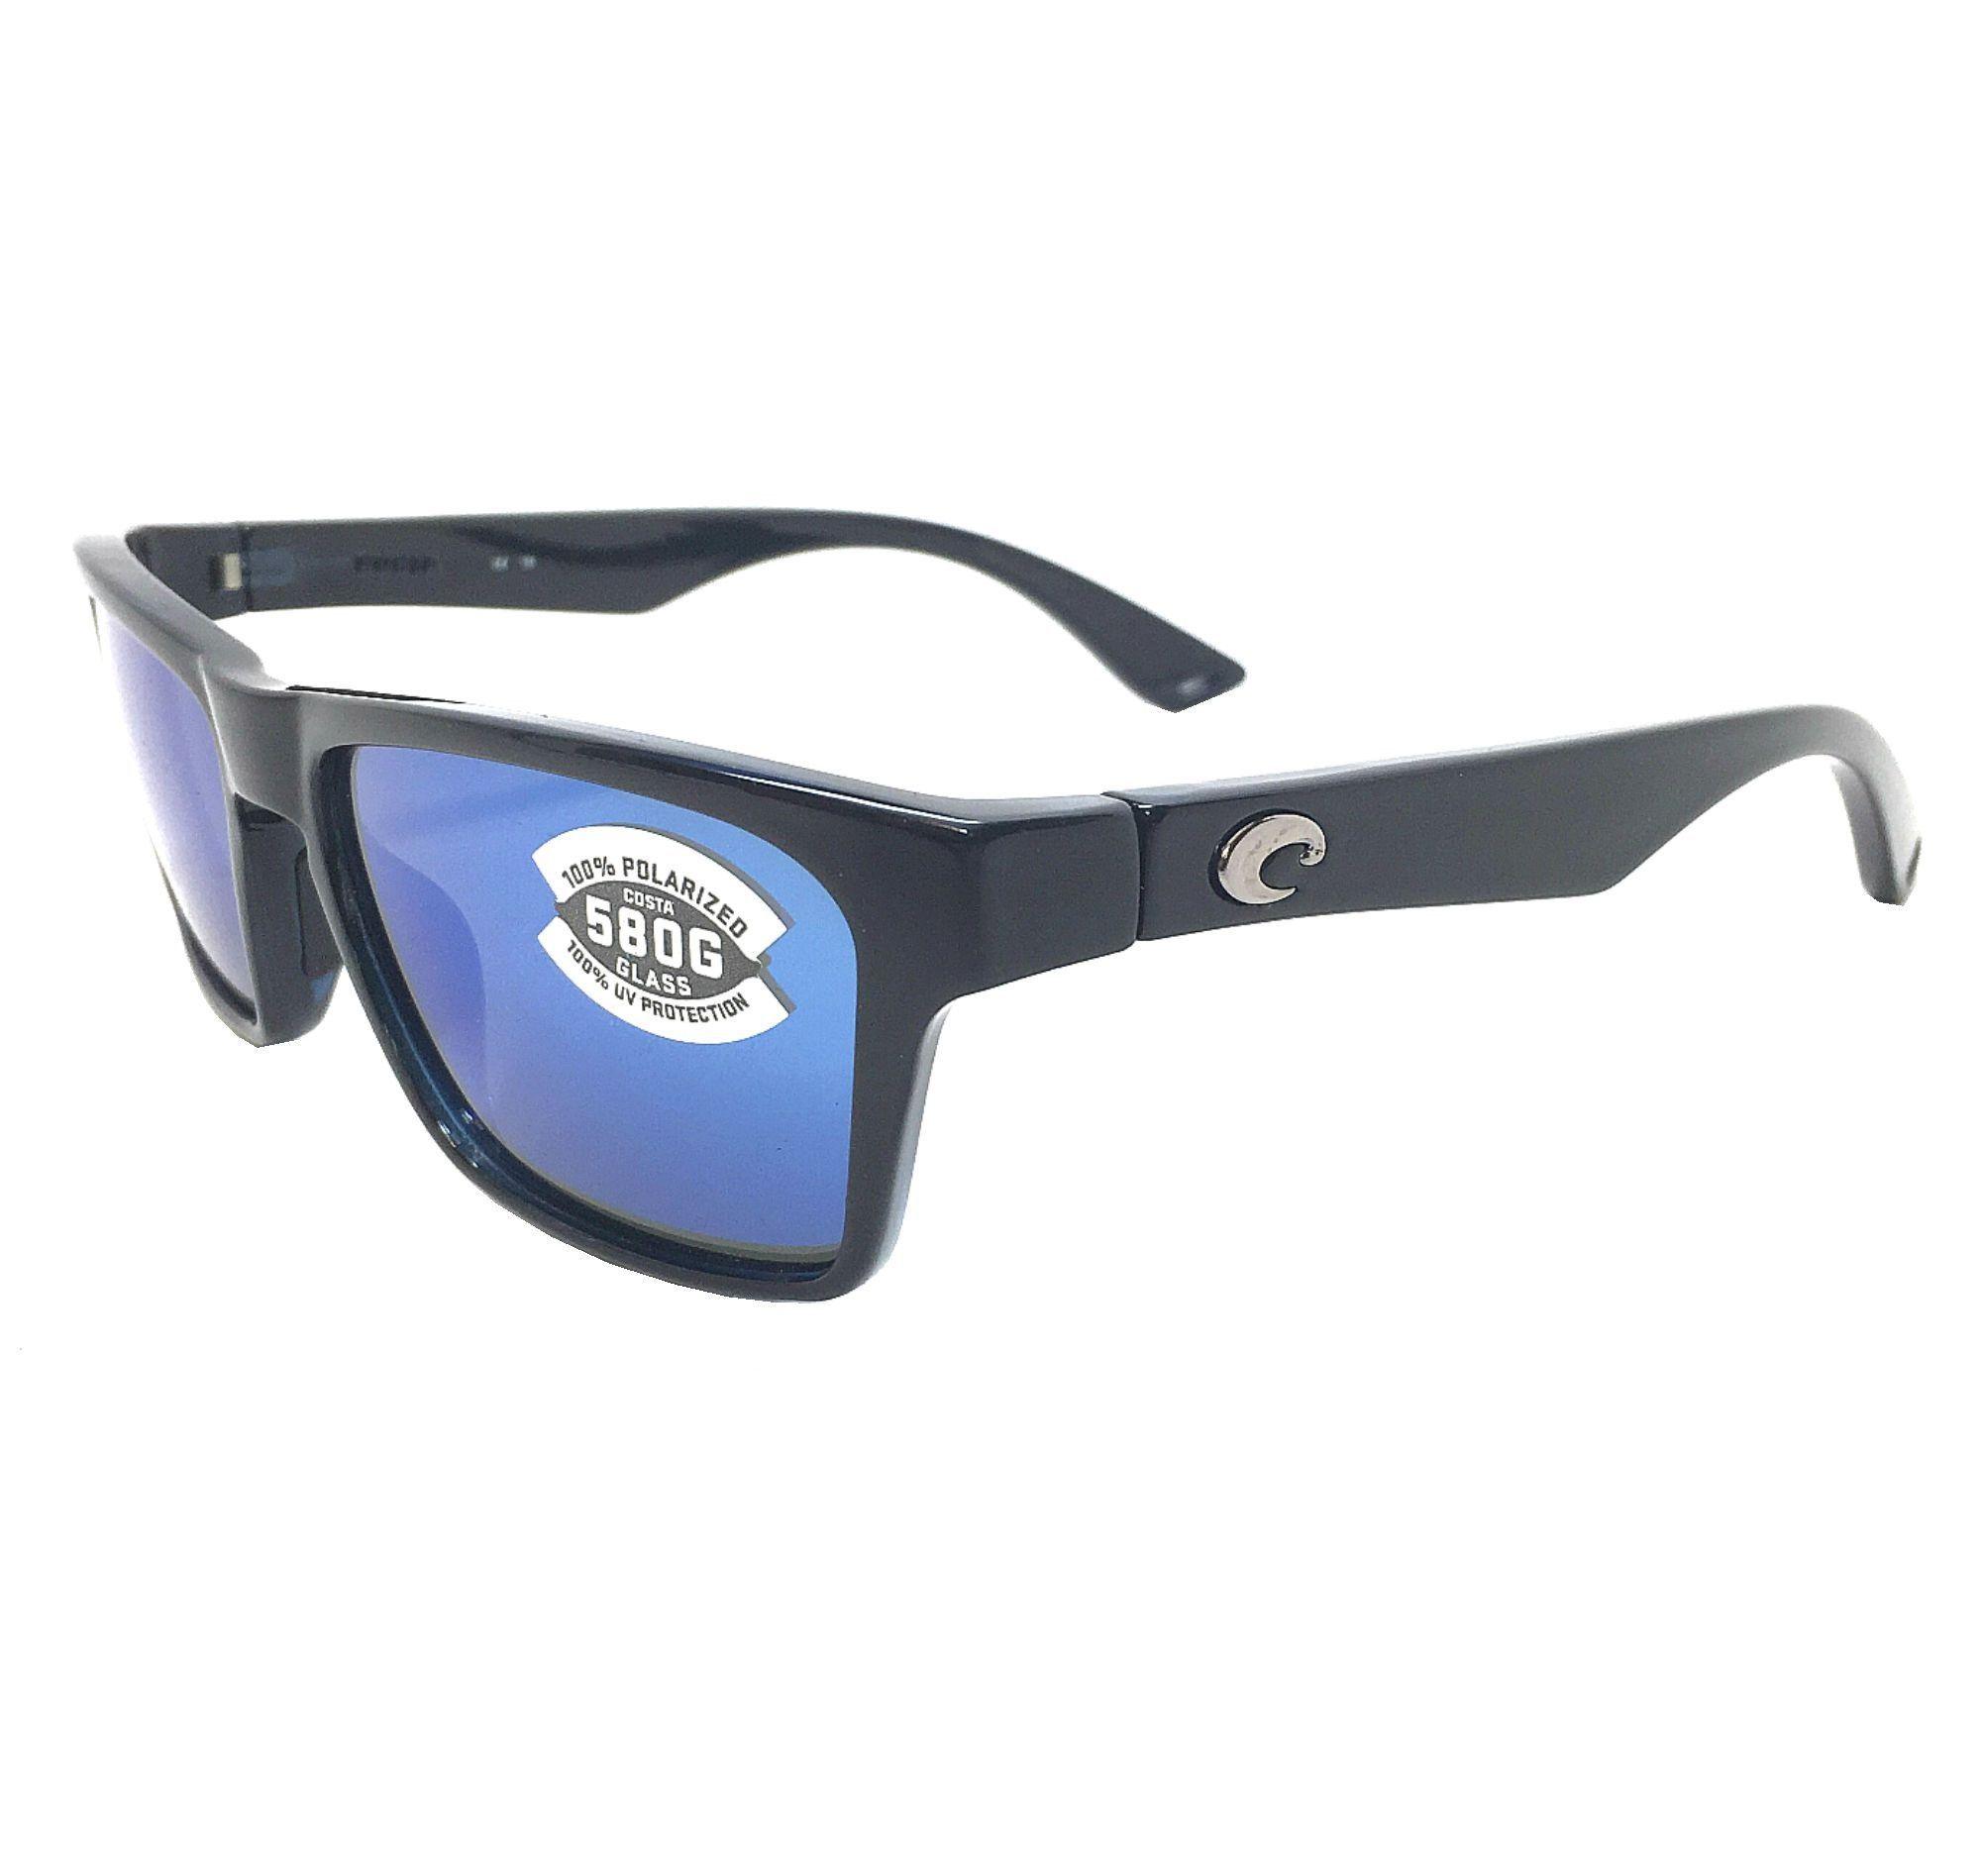 559481ab3a5b7 Costa Del Mar Hinano 580G Black Blue Mirror Polarized Sunglasses ...